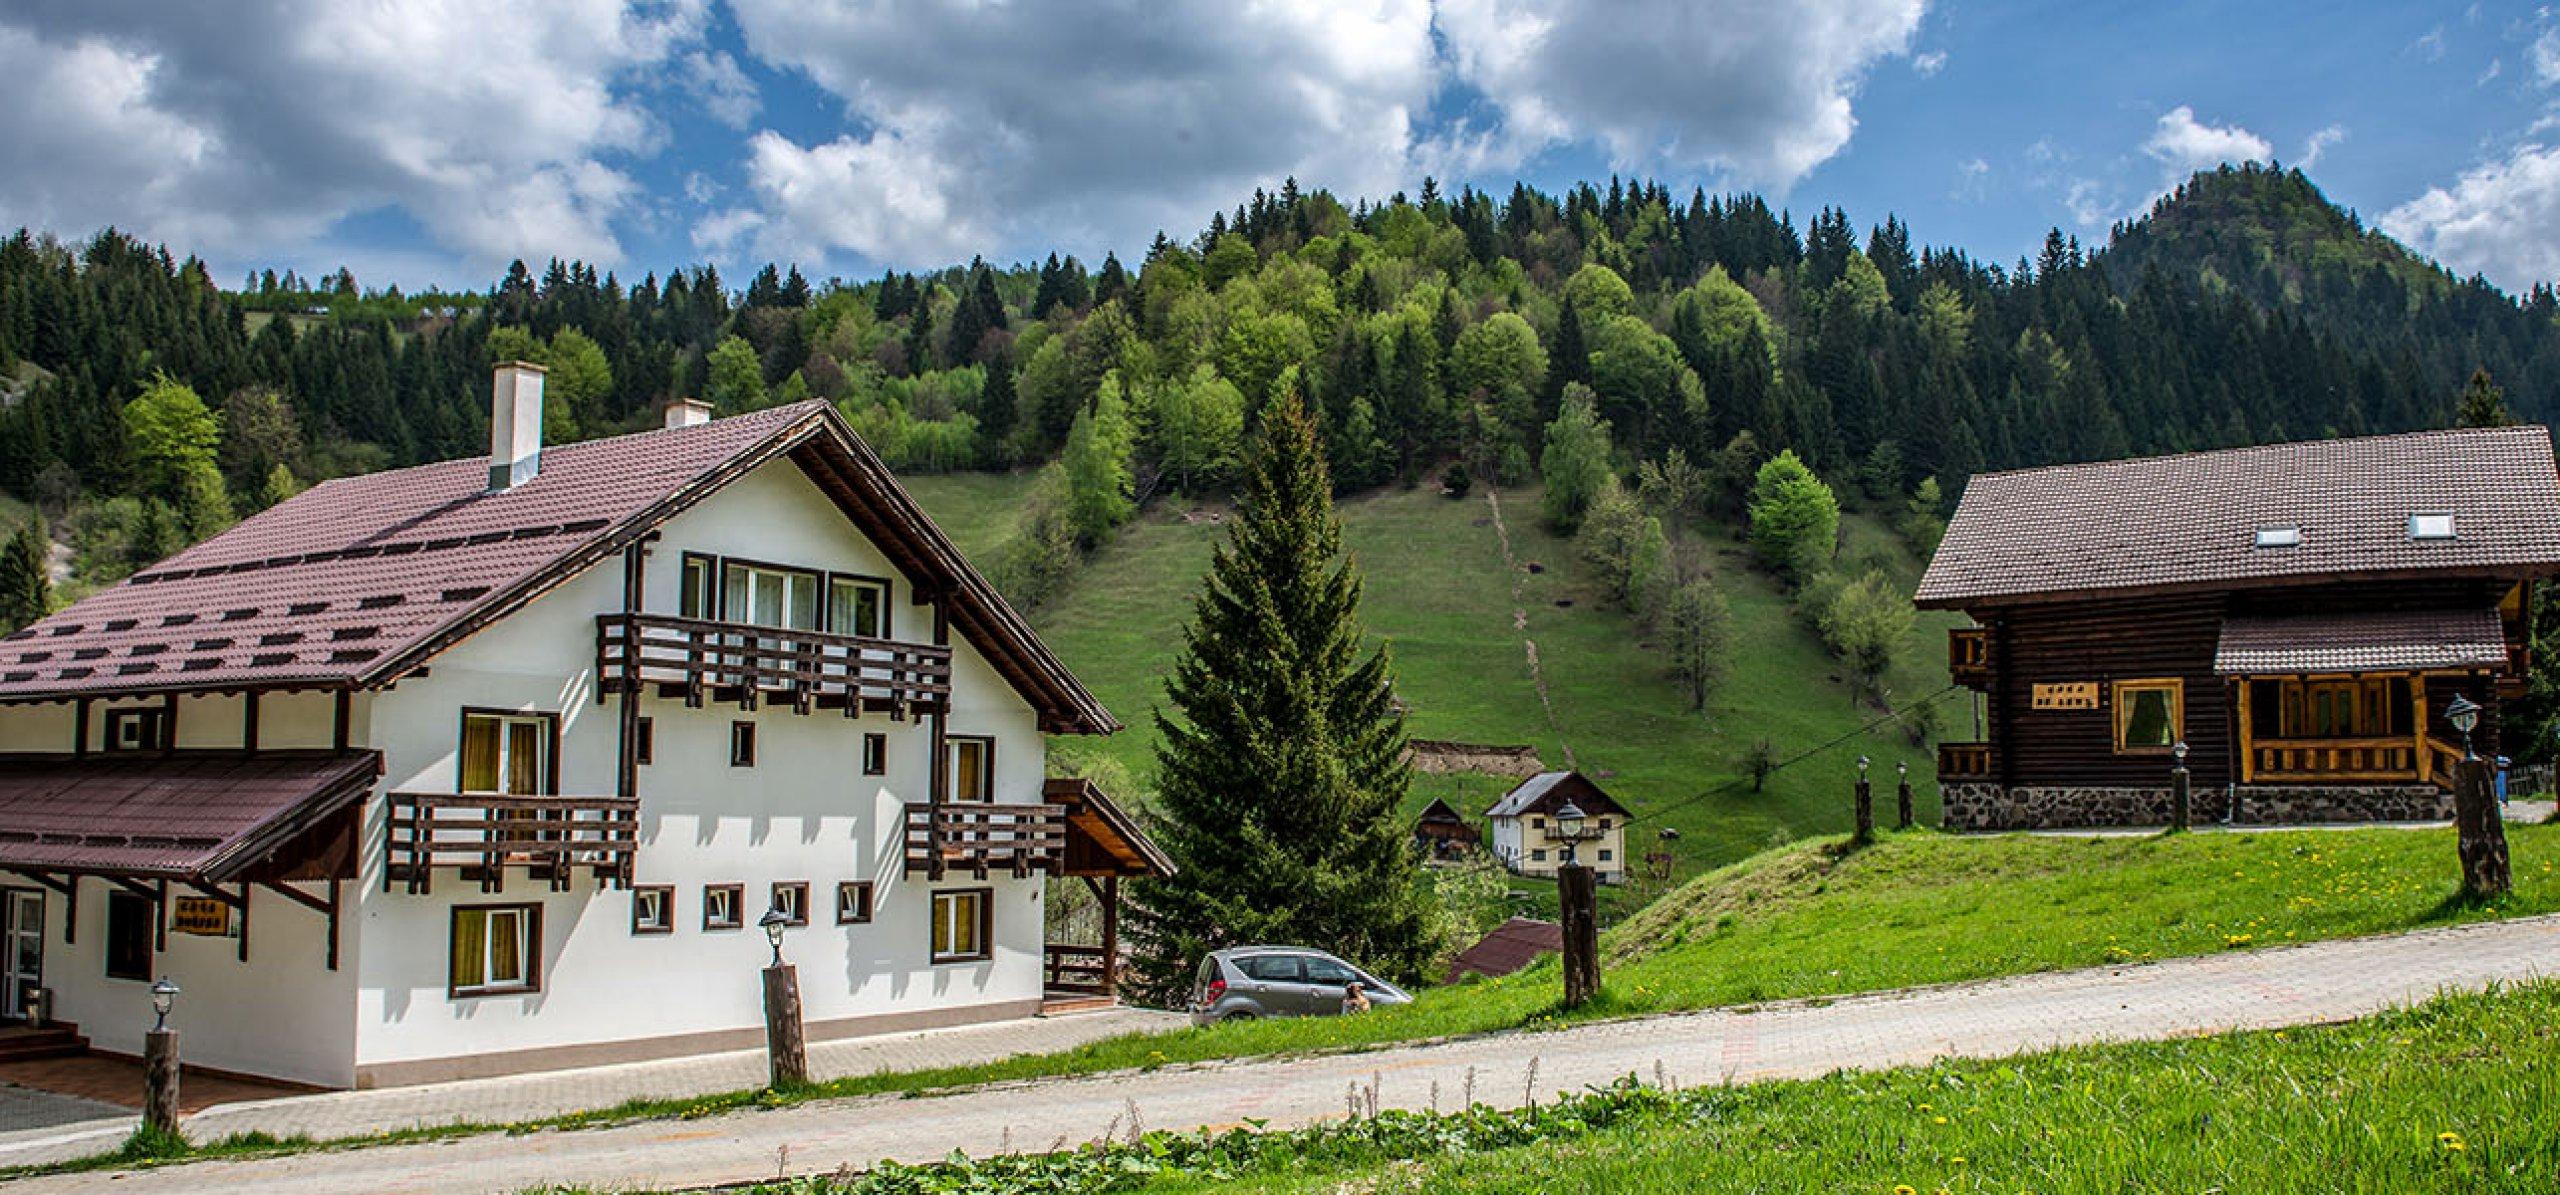 vila-de-lemn-peisaj-montan-cazare-in-moeciu-1